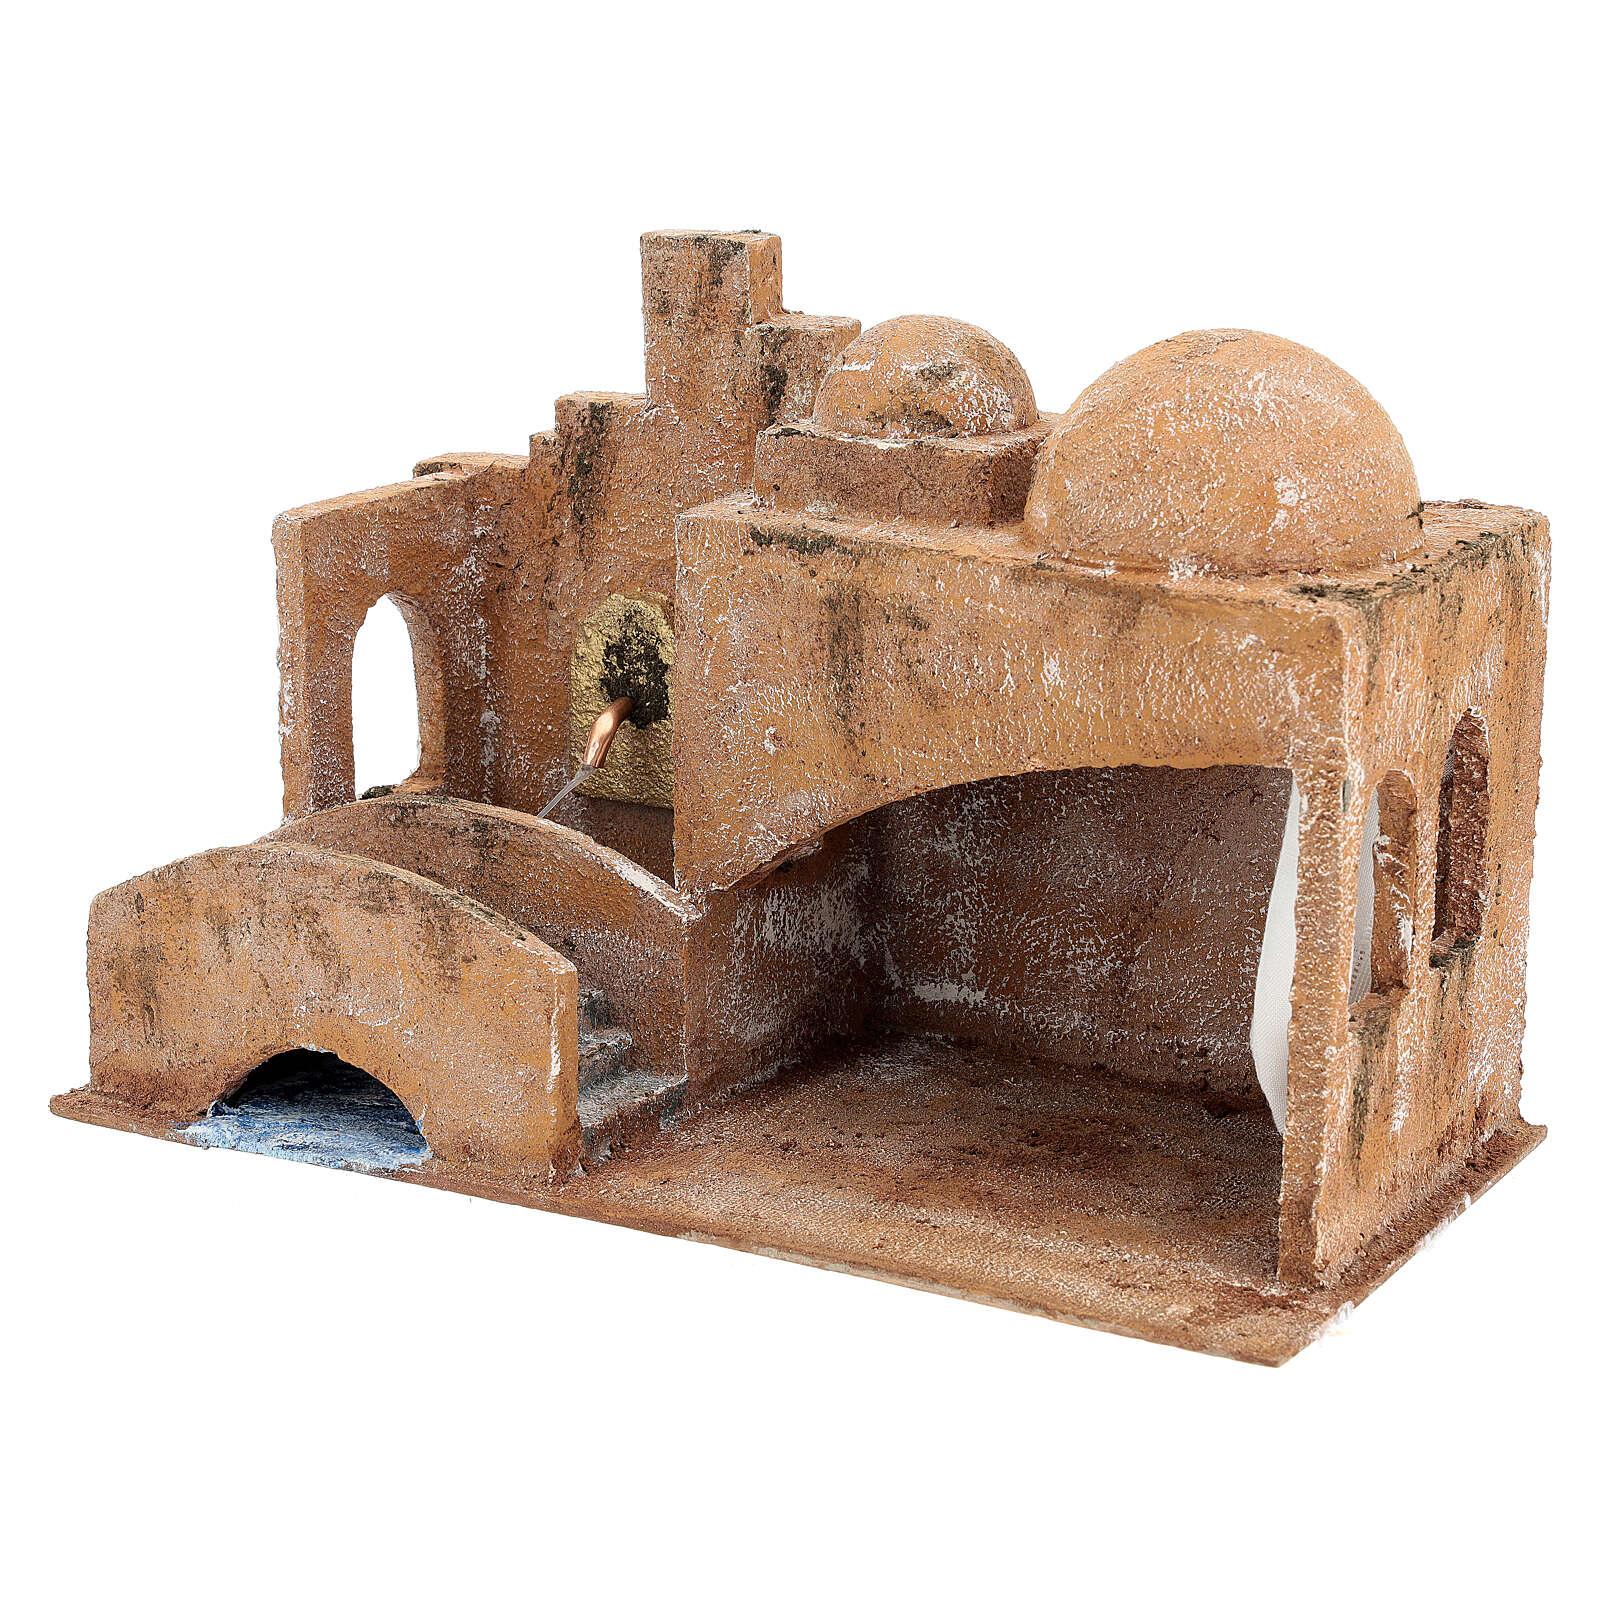 Capanna stile arabo con laghetto 20x35x20 presepe 12 cm 4